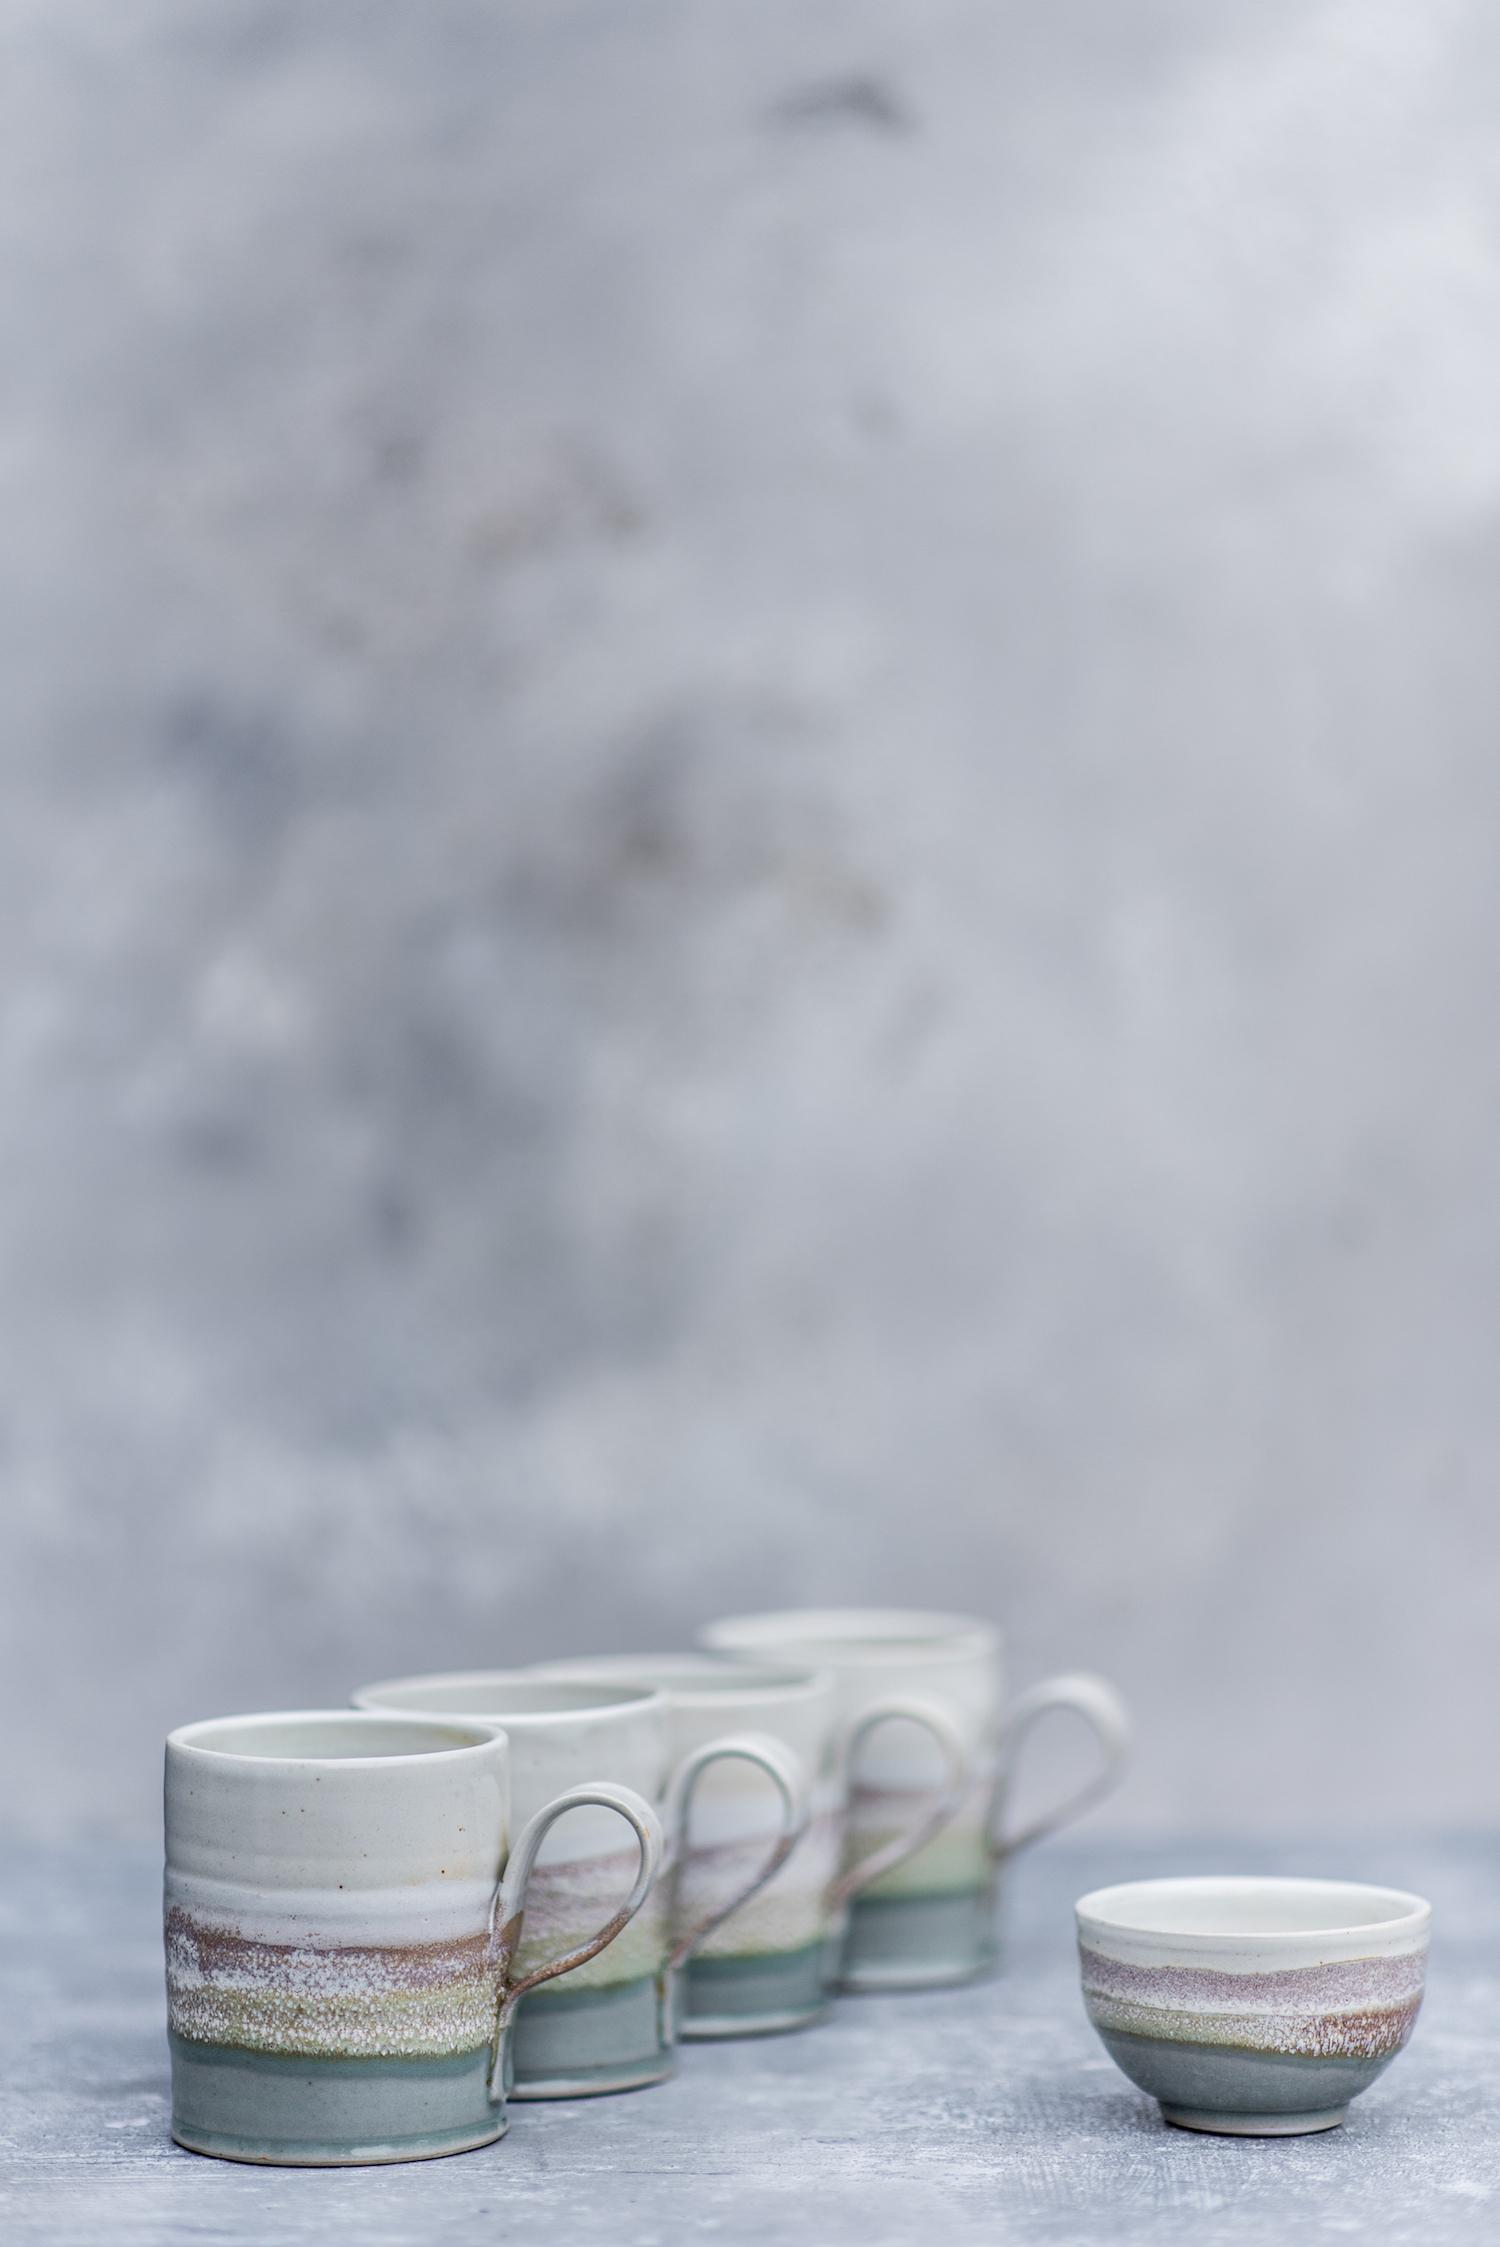 Mugs with Tiny Bowl